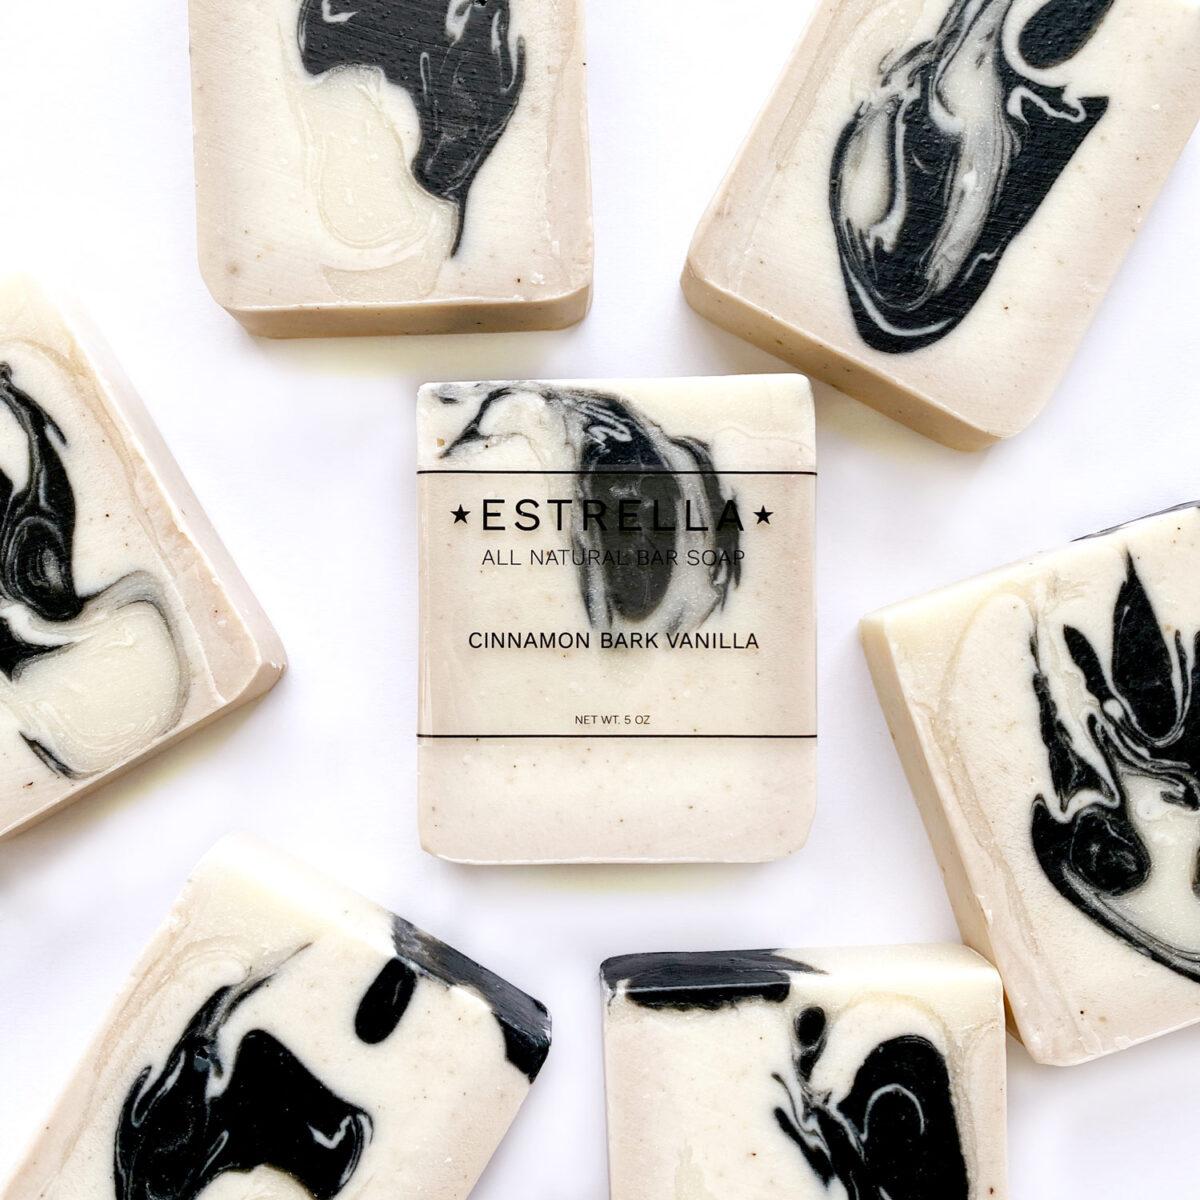 Cinnamon-Bark-Vanilla-Soap-2021